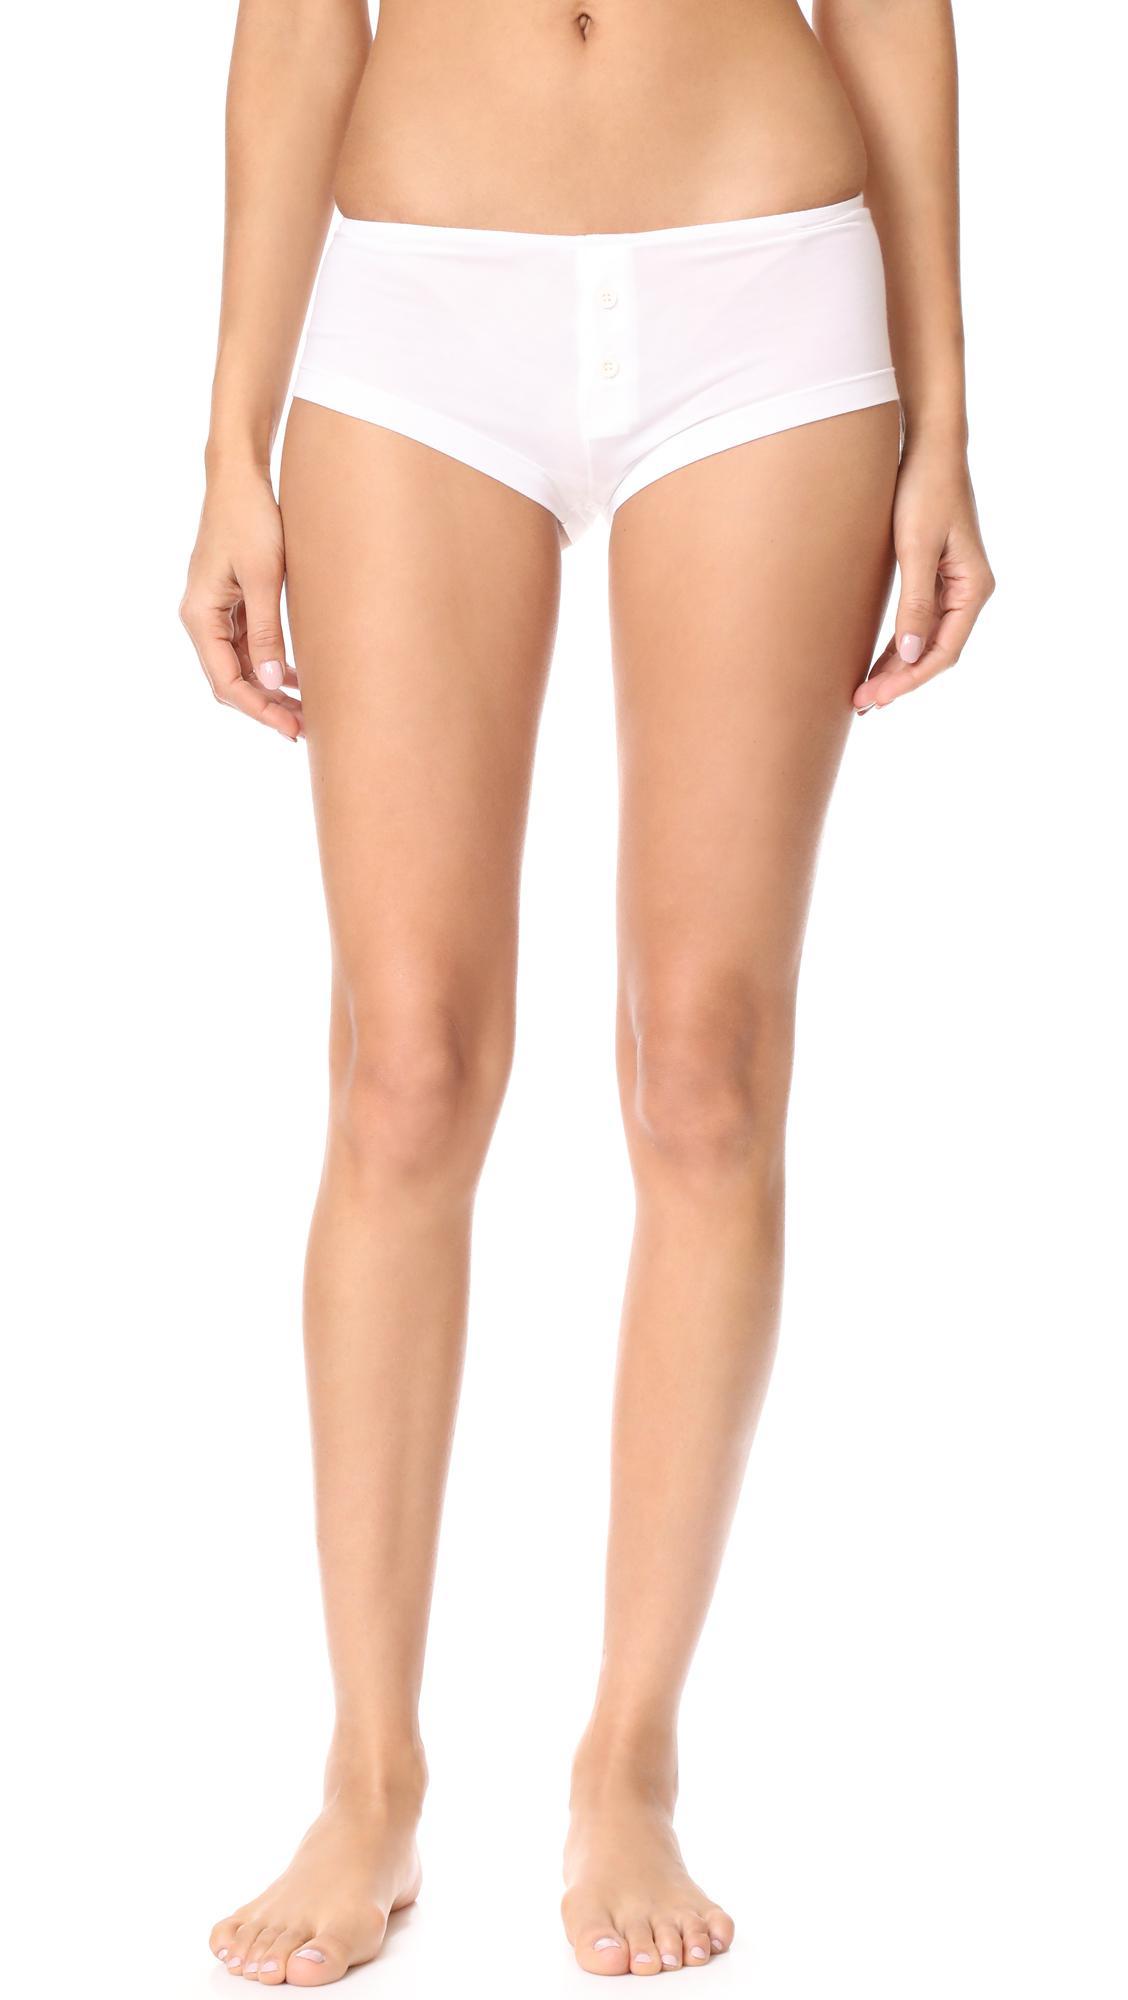 Kiki de Montparnasse Stretch-lace Boy Shorts Affordable Sale Online Free Shipping Explore MetqLxgl